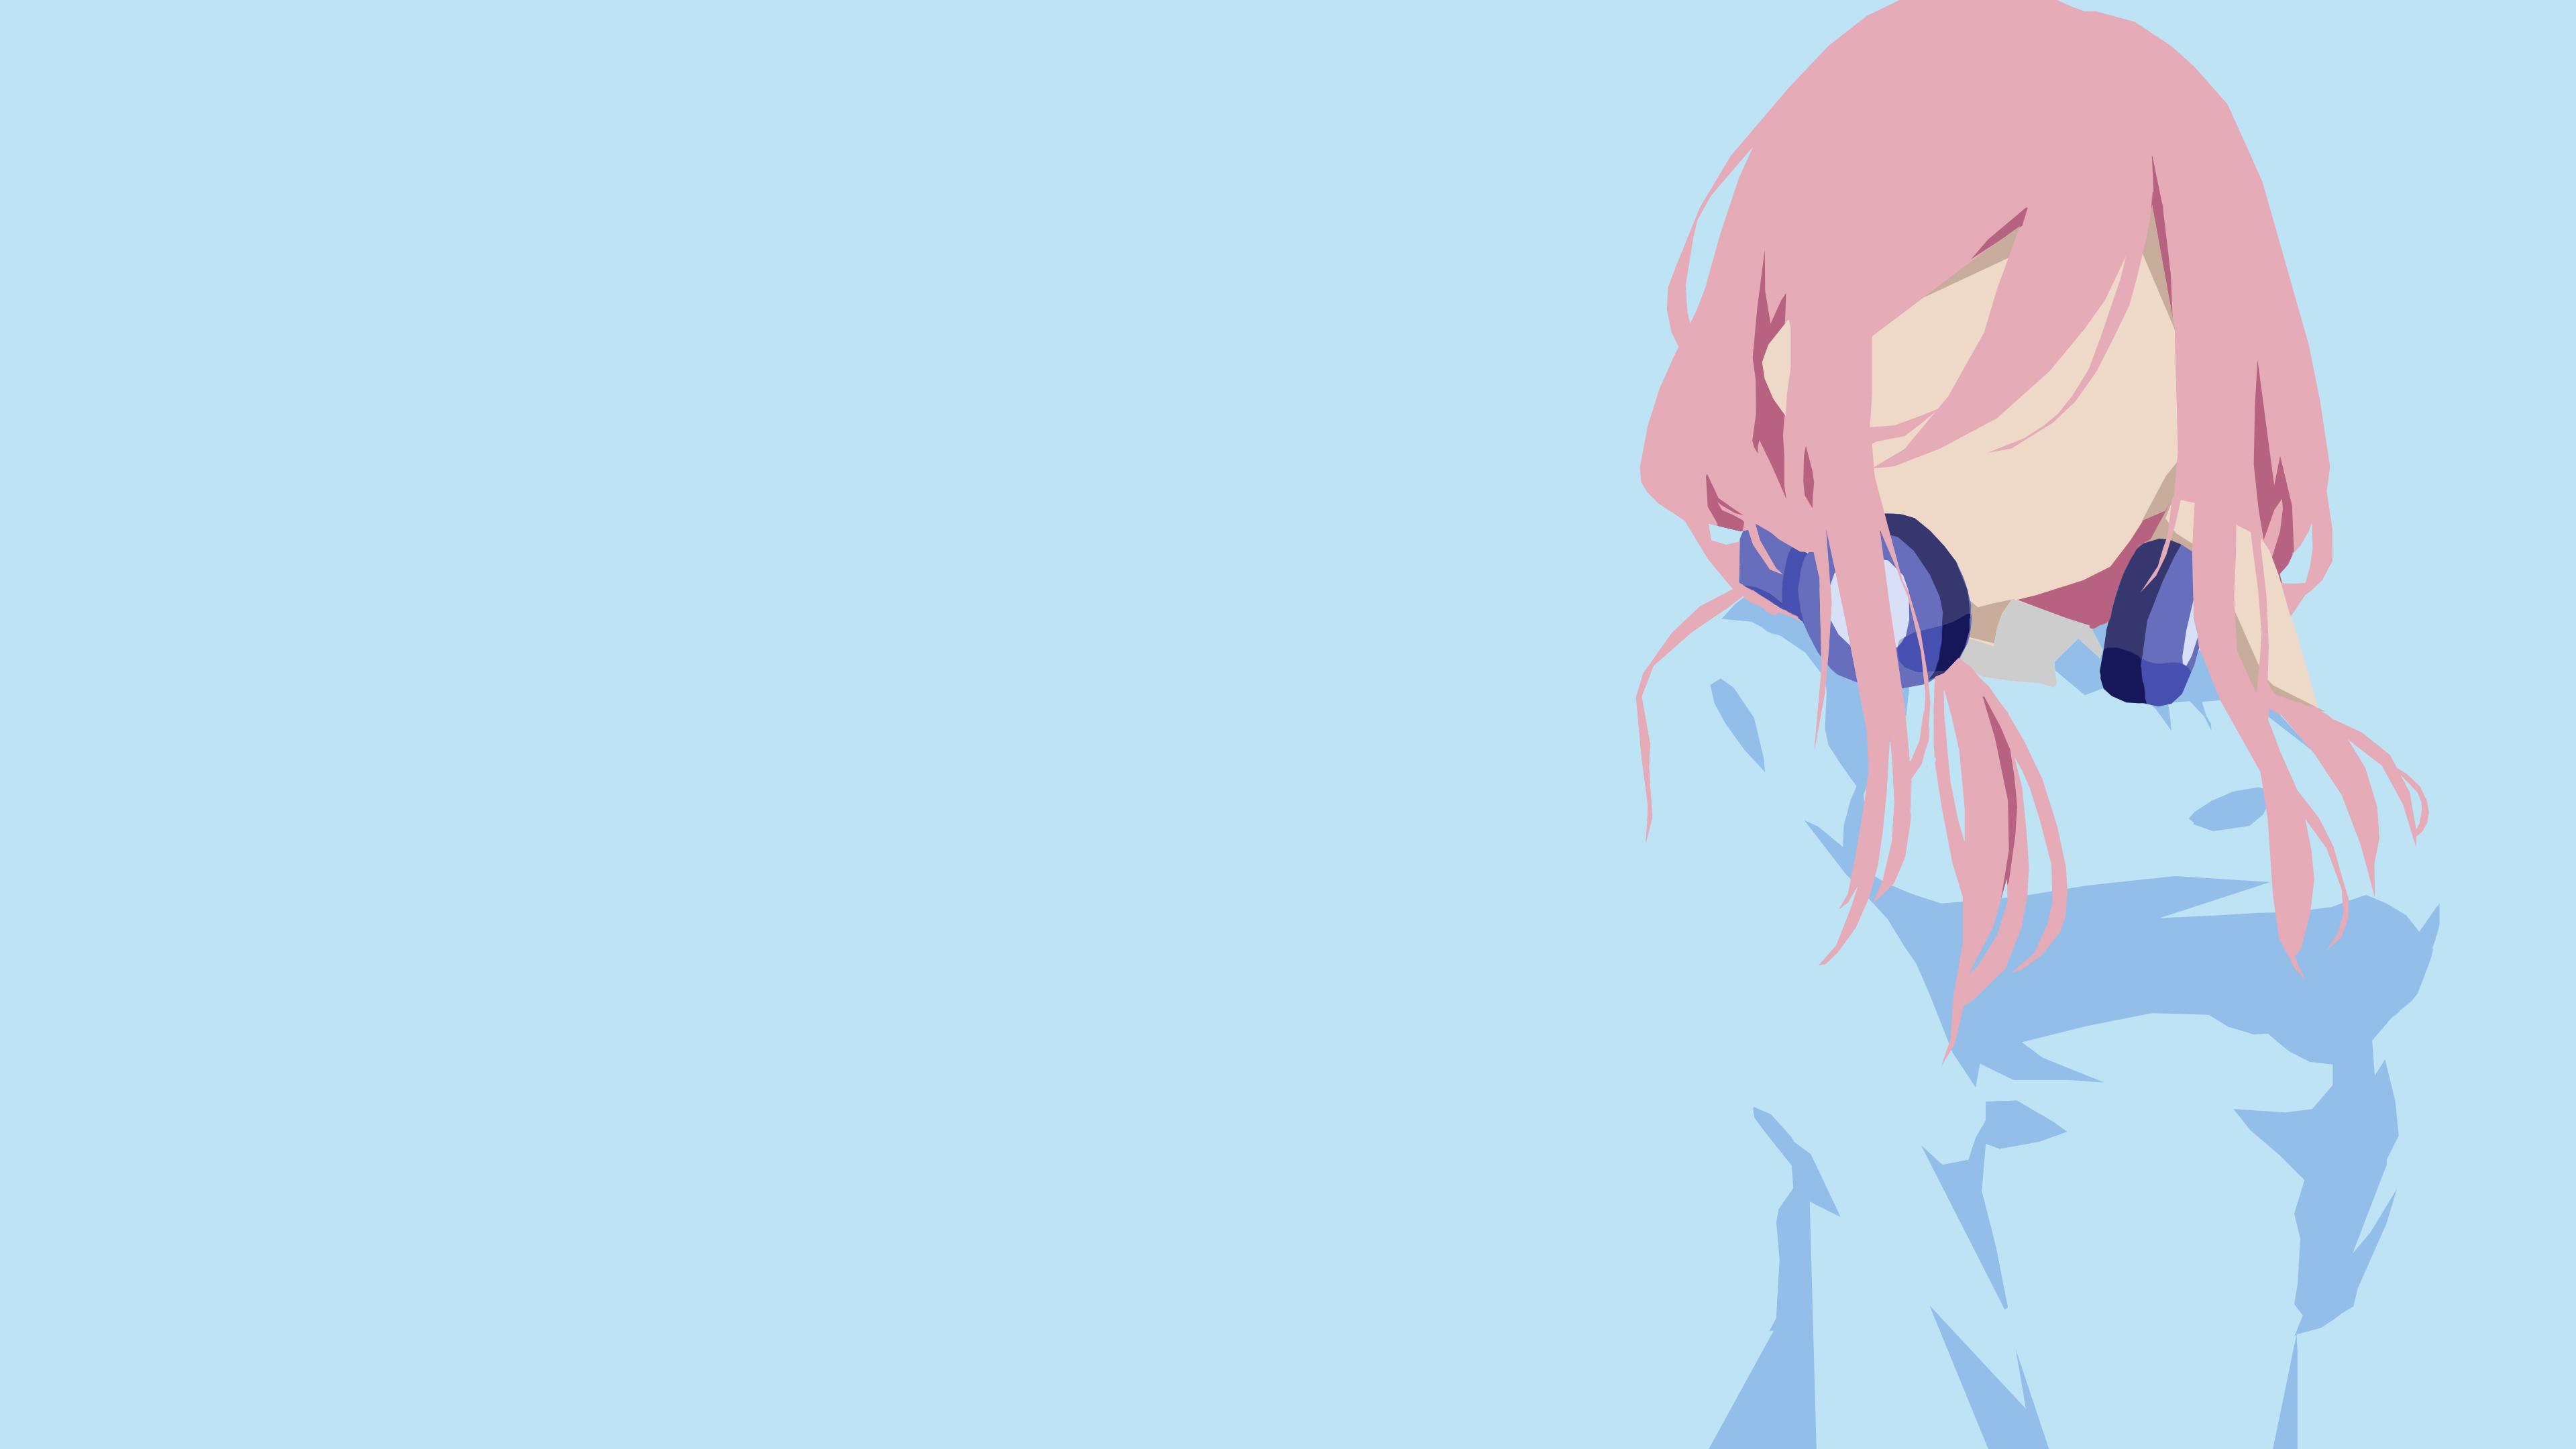 Anime Vector Wallpaper Nakano Miku By Ichiror On Deviantart